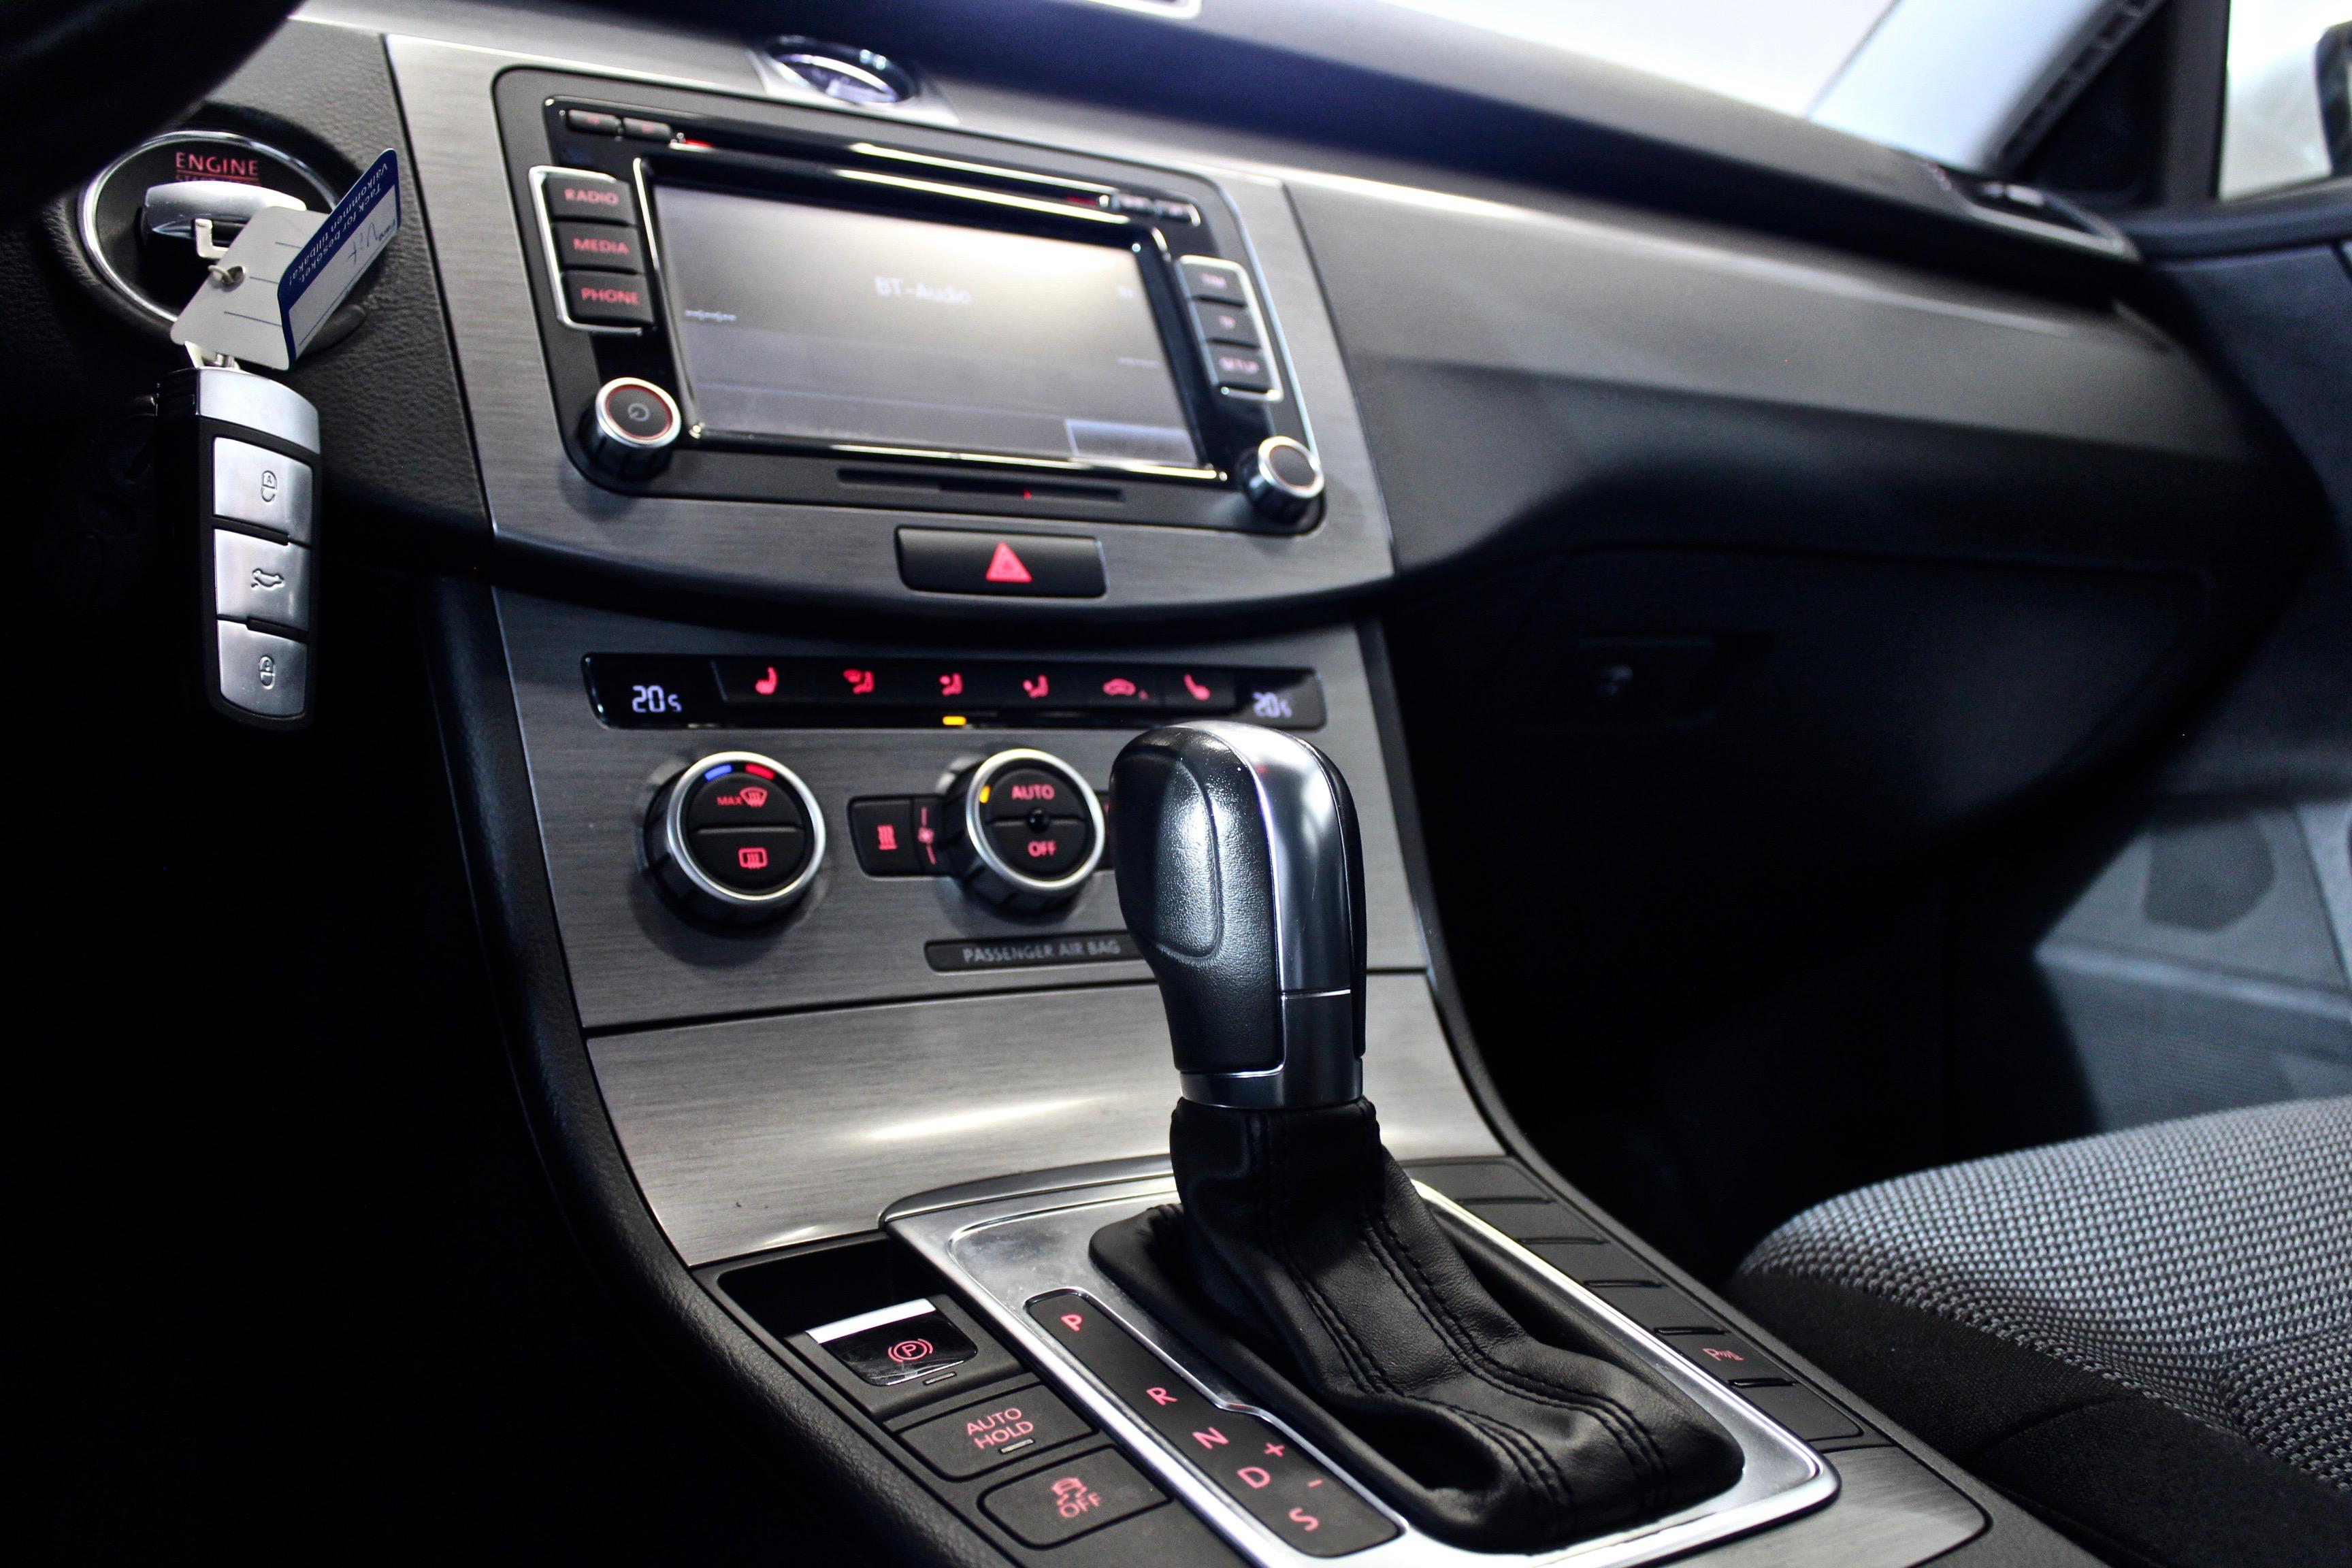 Volkswagen Passat Variant 1.4 TSI EcoFuel DSG Sekventiell 150hk (SÅLD)